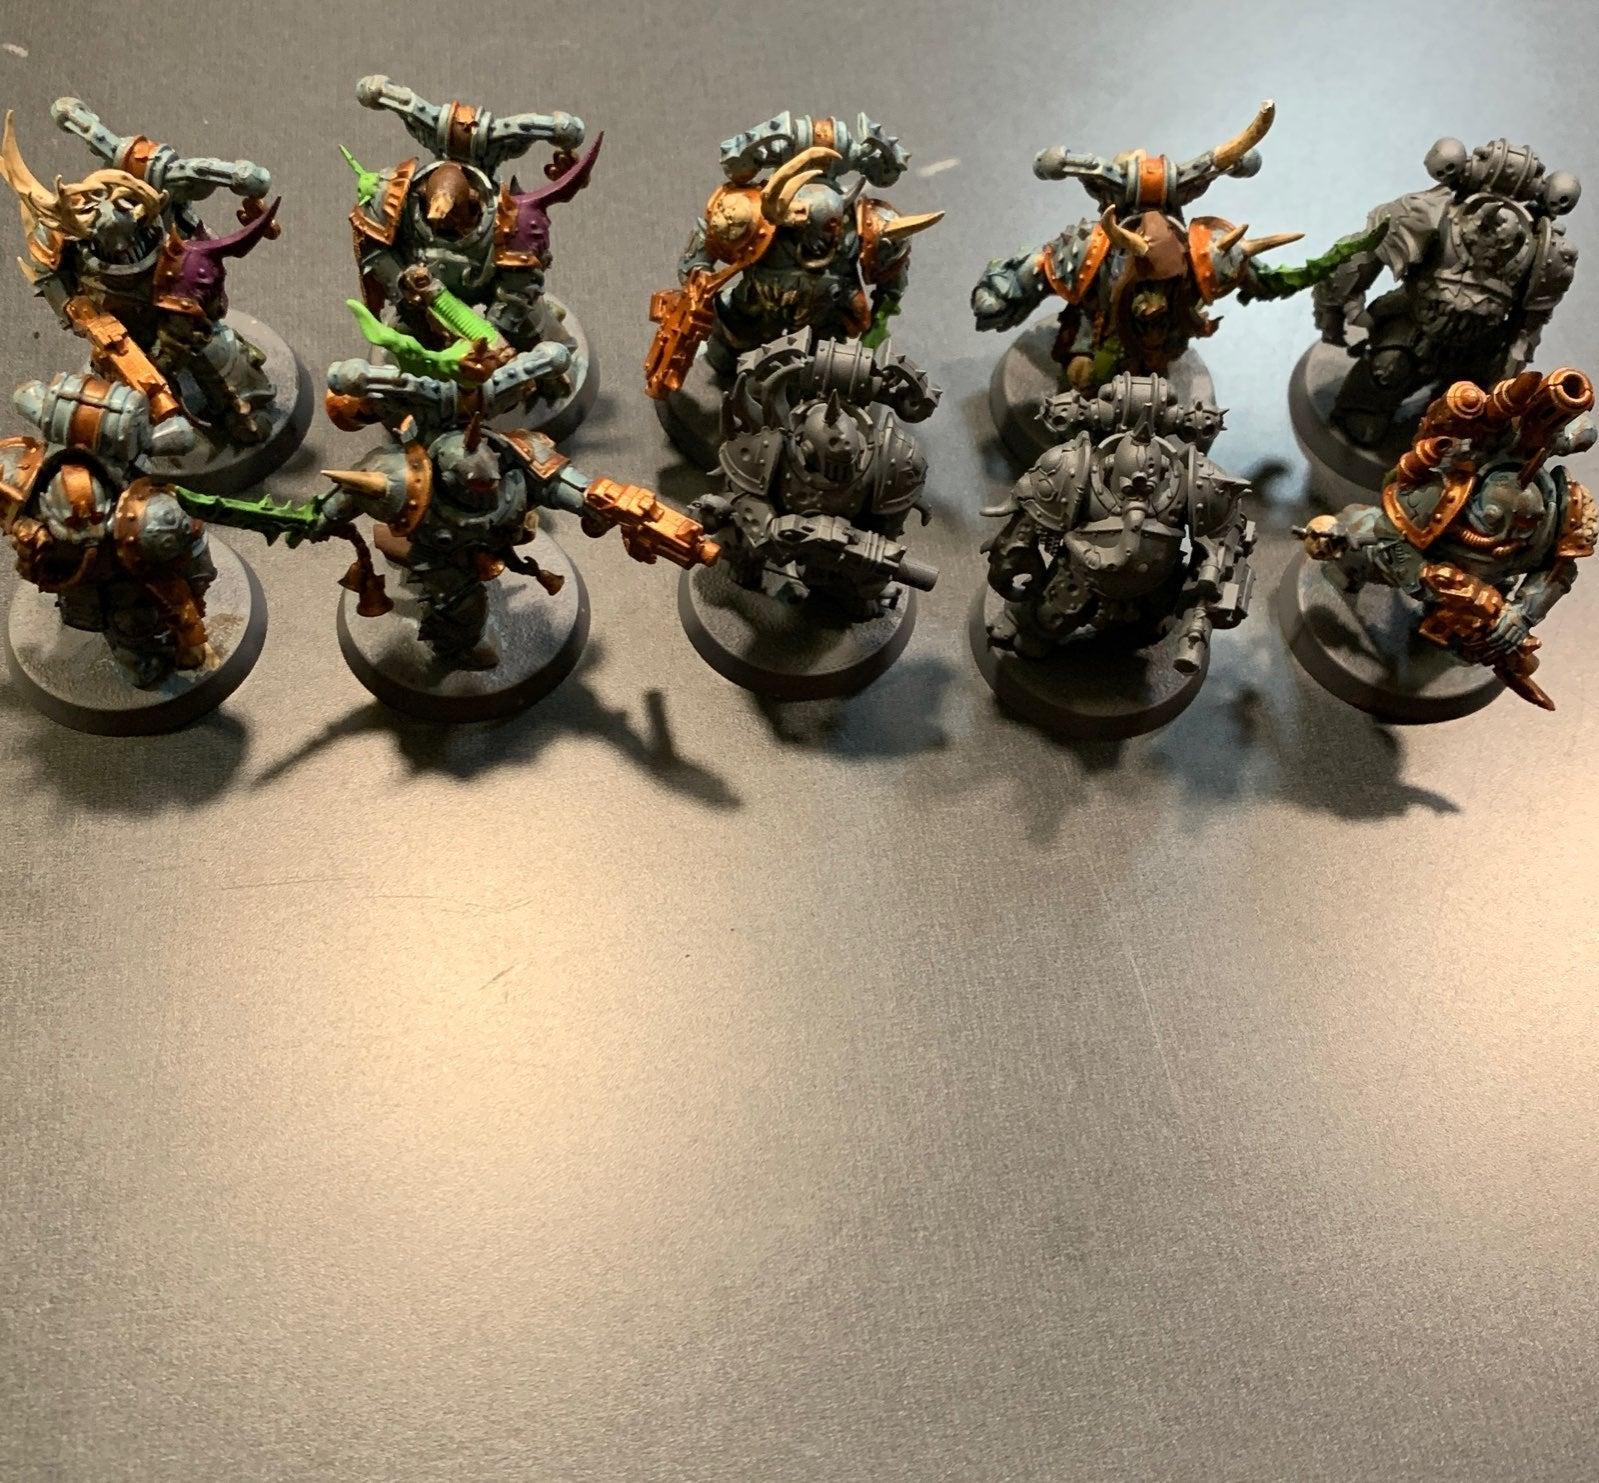 Warhammer 10 plauge marines